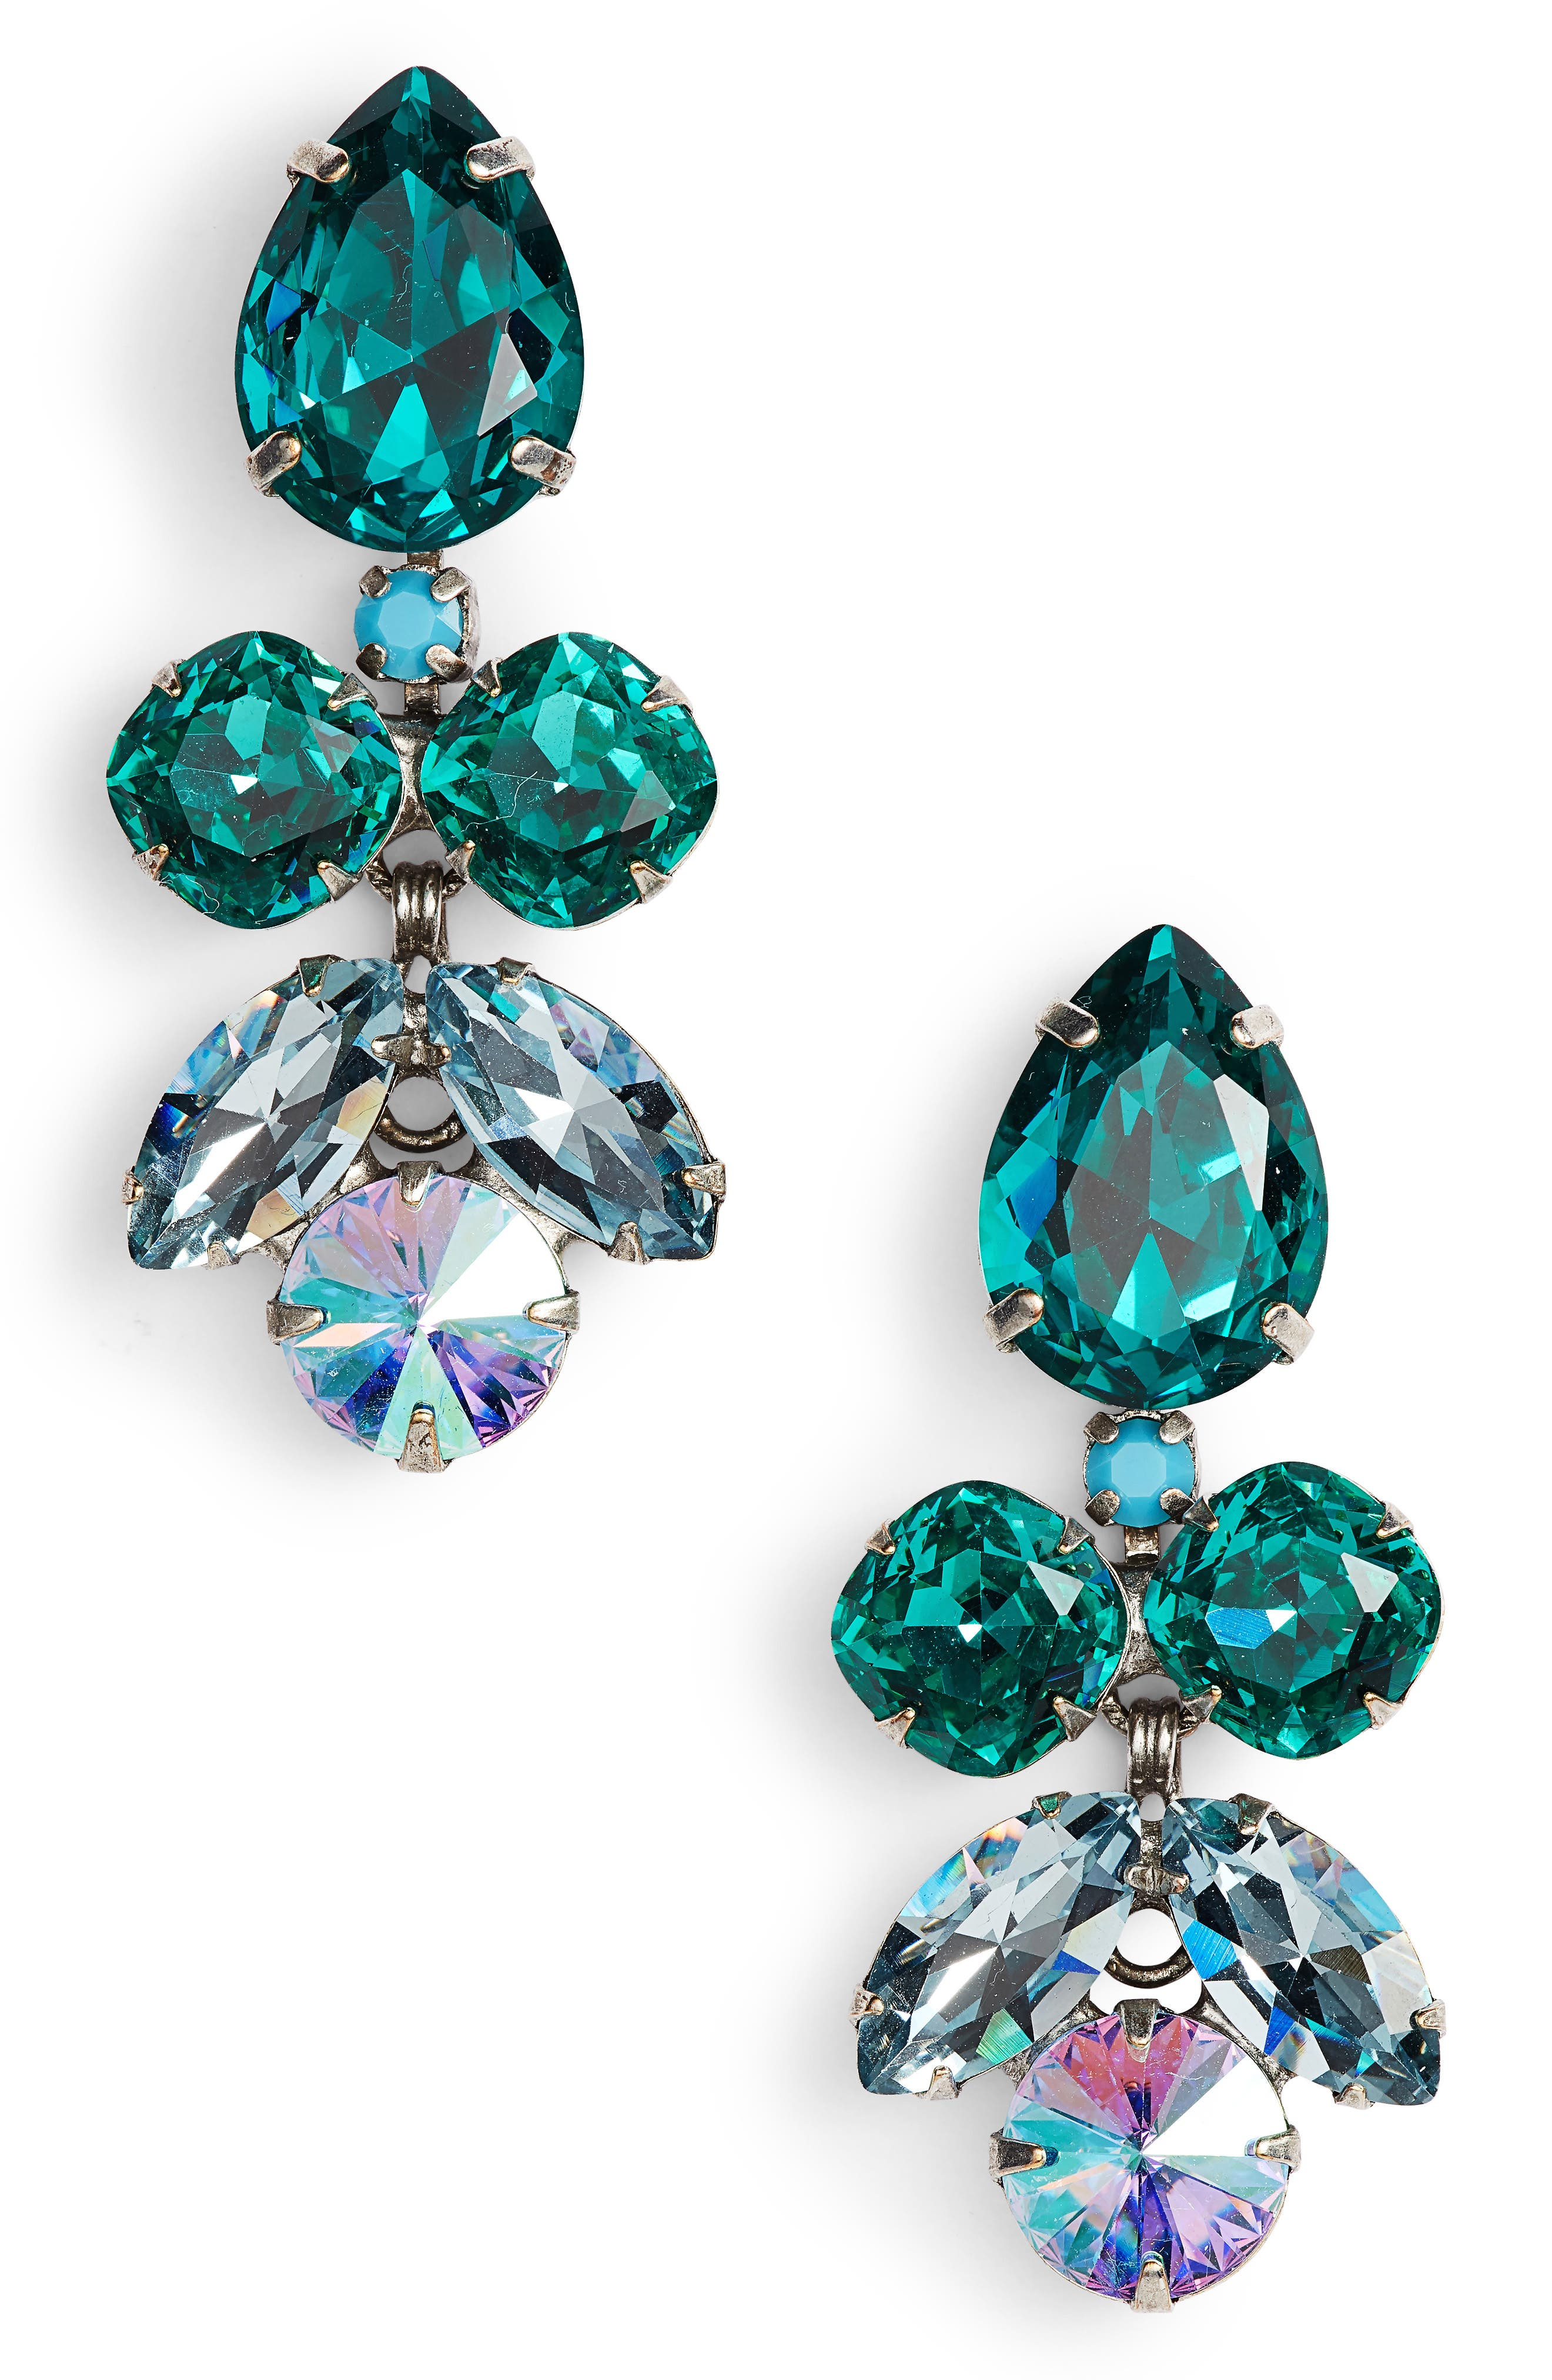 Lotus Flower Crystal Drop Earrings,                             Main thumbnail 1, color,                             Blue-Green